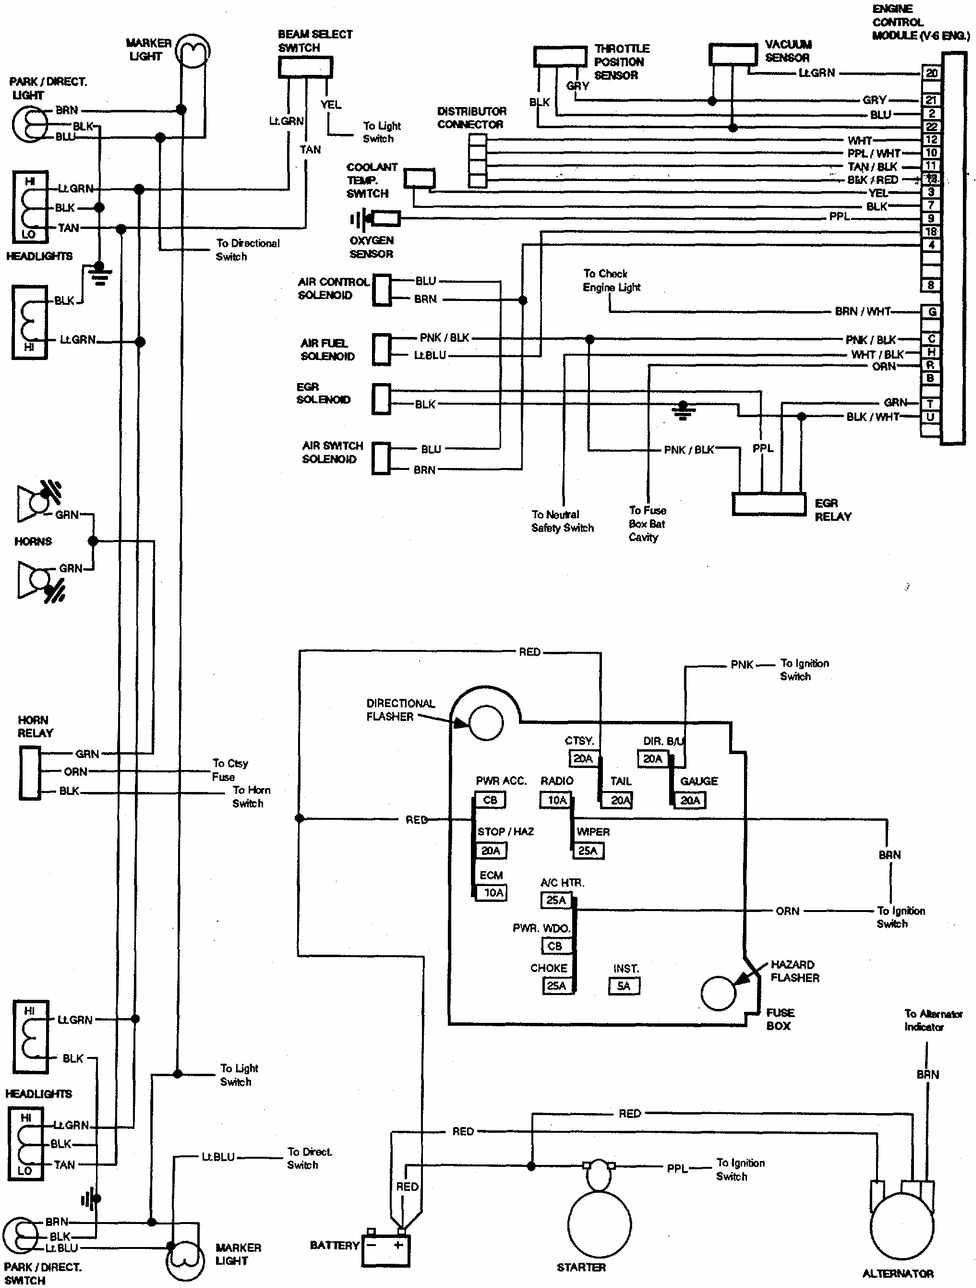 Fantastic 1986 International Truck Wiring Vulcan Freeloader 260. Amazing Wiring Diagram 1989 Chevy Truck Key Lock Buzzer Battery Chevrolet V8 Trucks 1981 1987 Electrical. International Truck. International Trucks Wiring Diagram For 1990 At Scoala.co